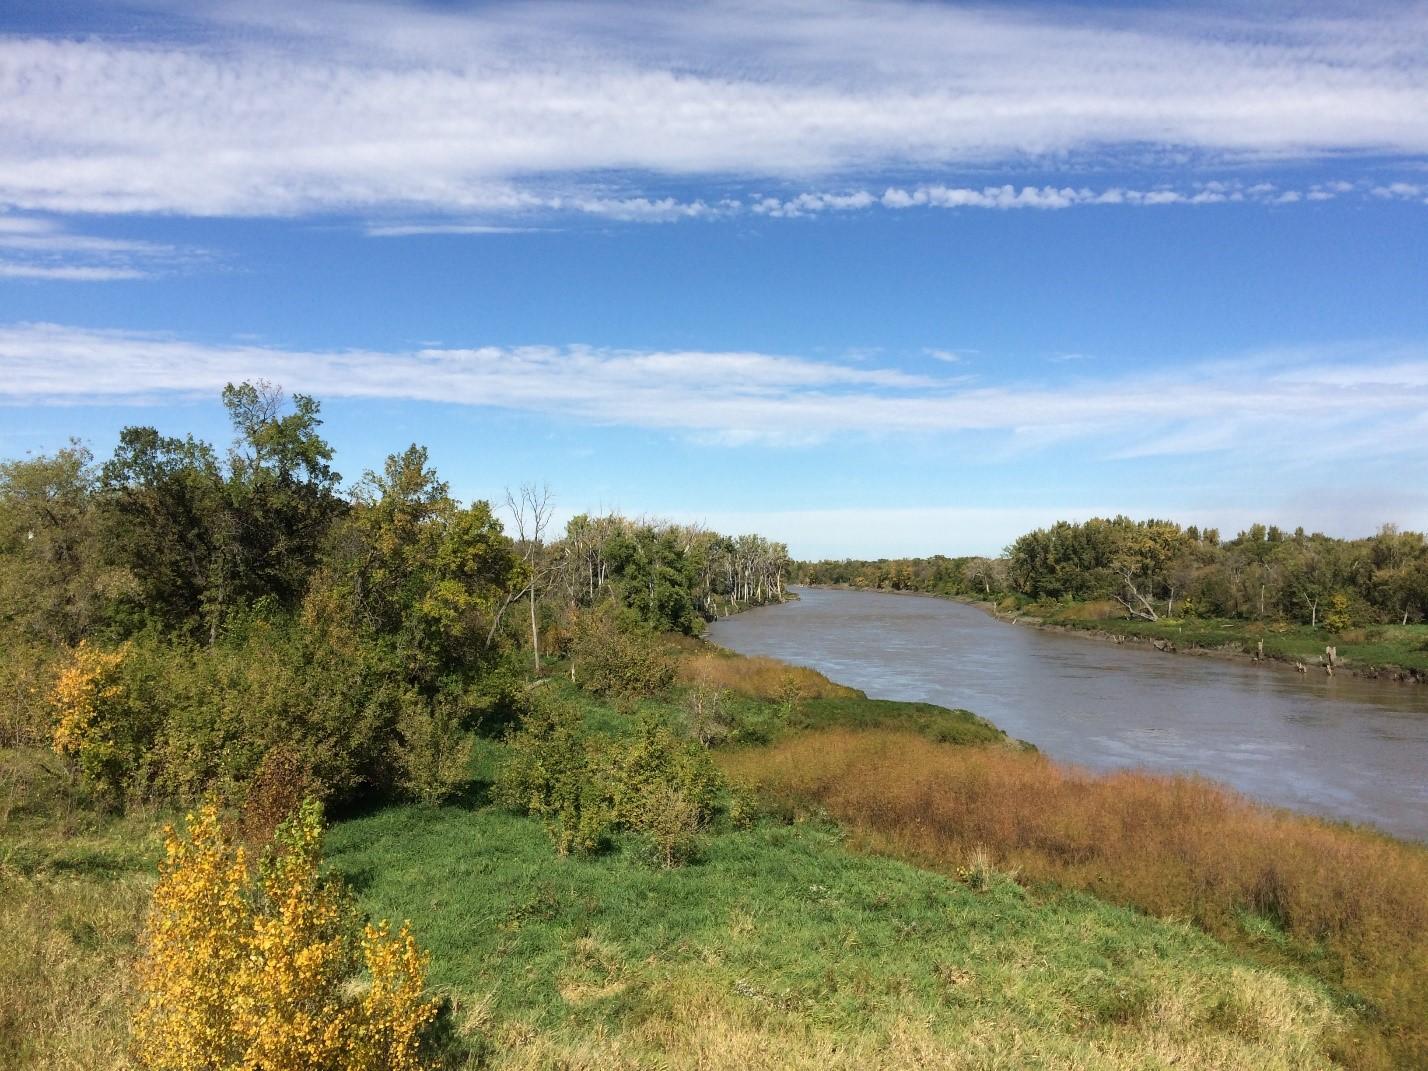 Red River flowing Manitoba